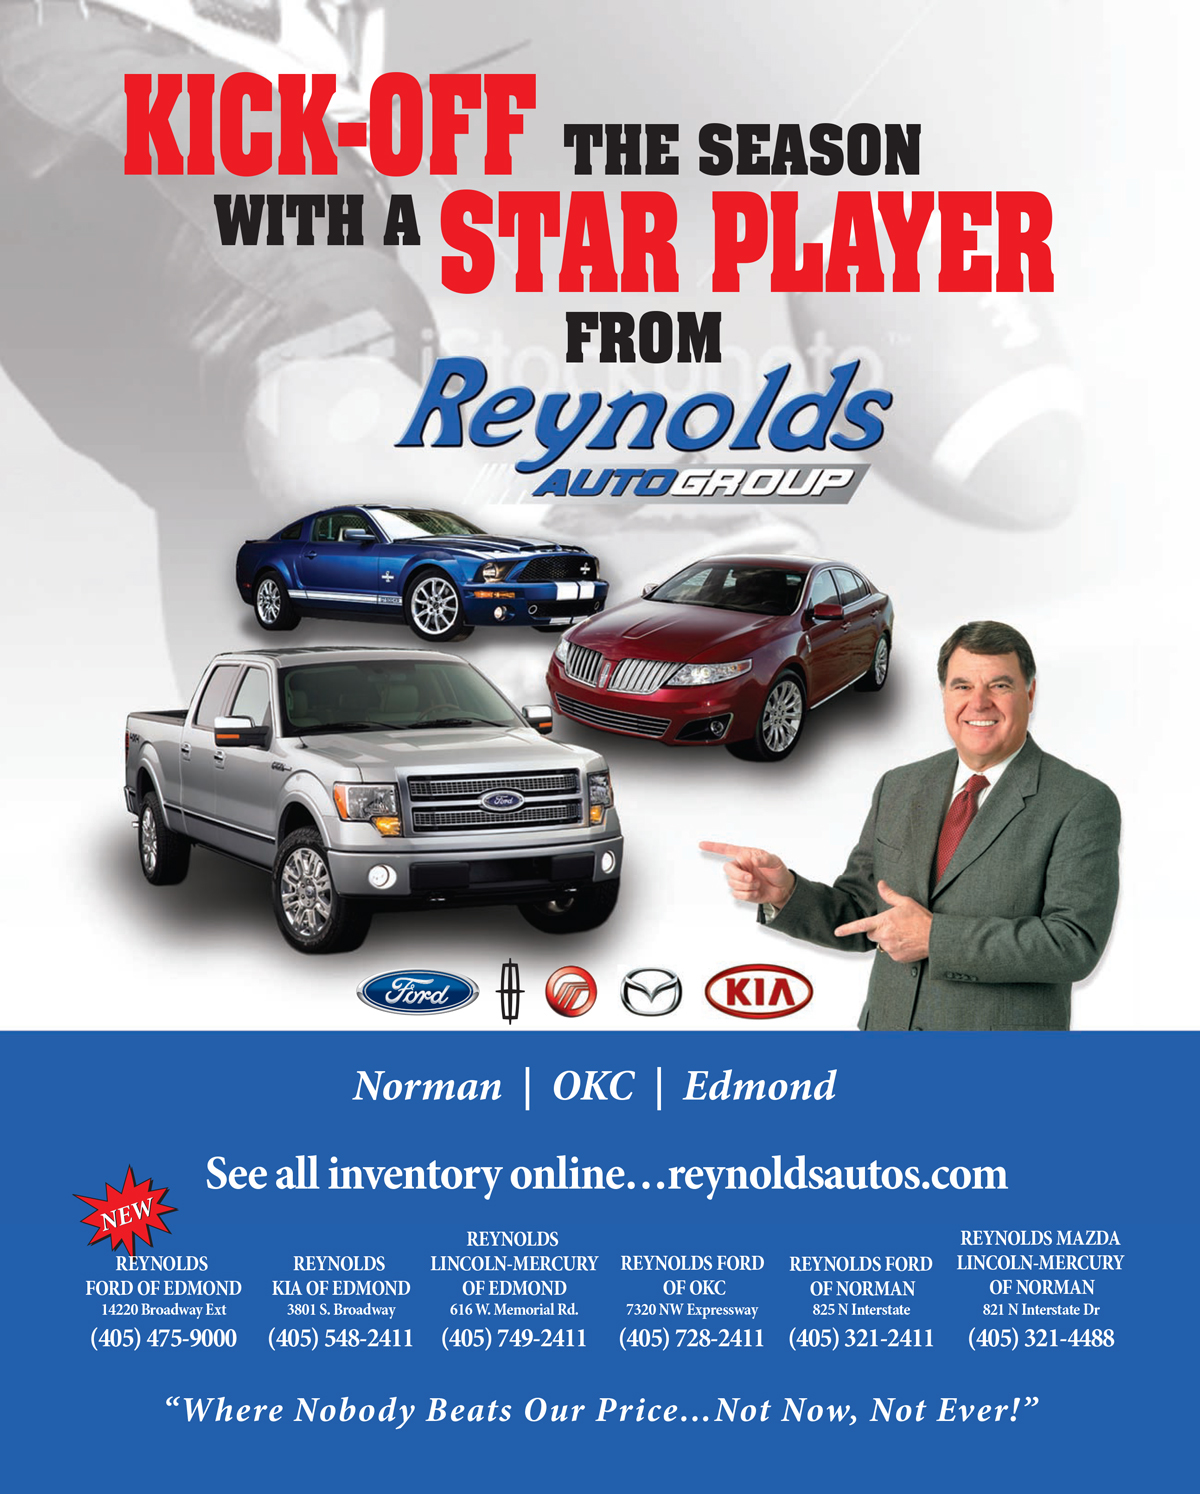 cooper logos edmond dealer joe dealership oklahoma of okc logo ford in city make near